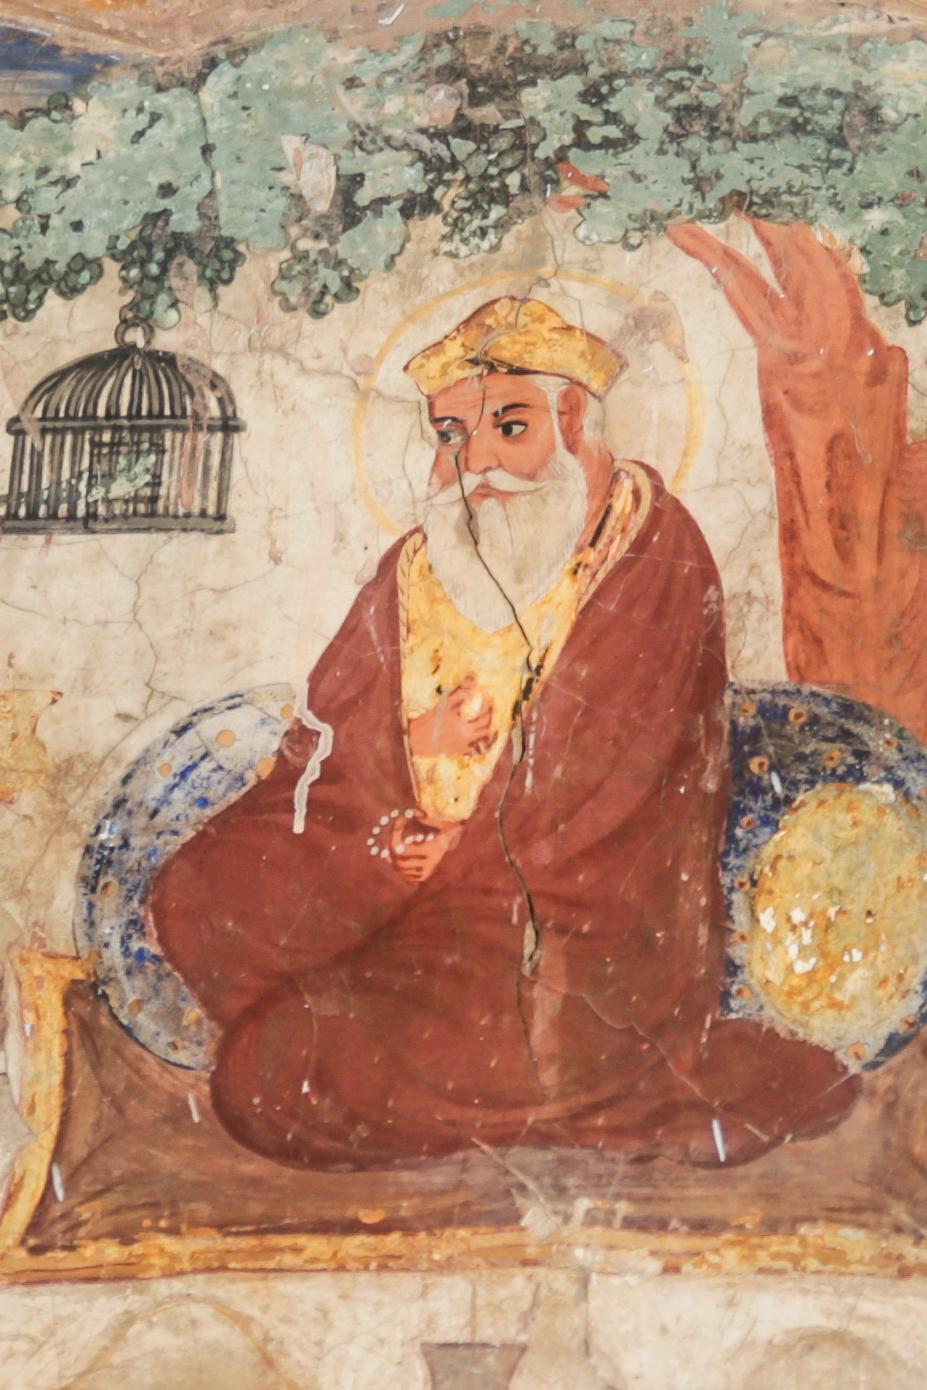 Mural_painting_of_Guru_Nanak_from_Gurdwara_Baba_Atal_Rai.jpg